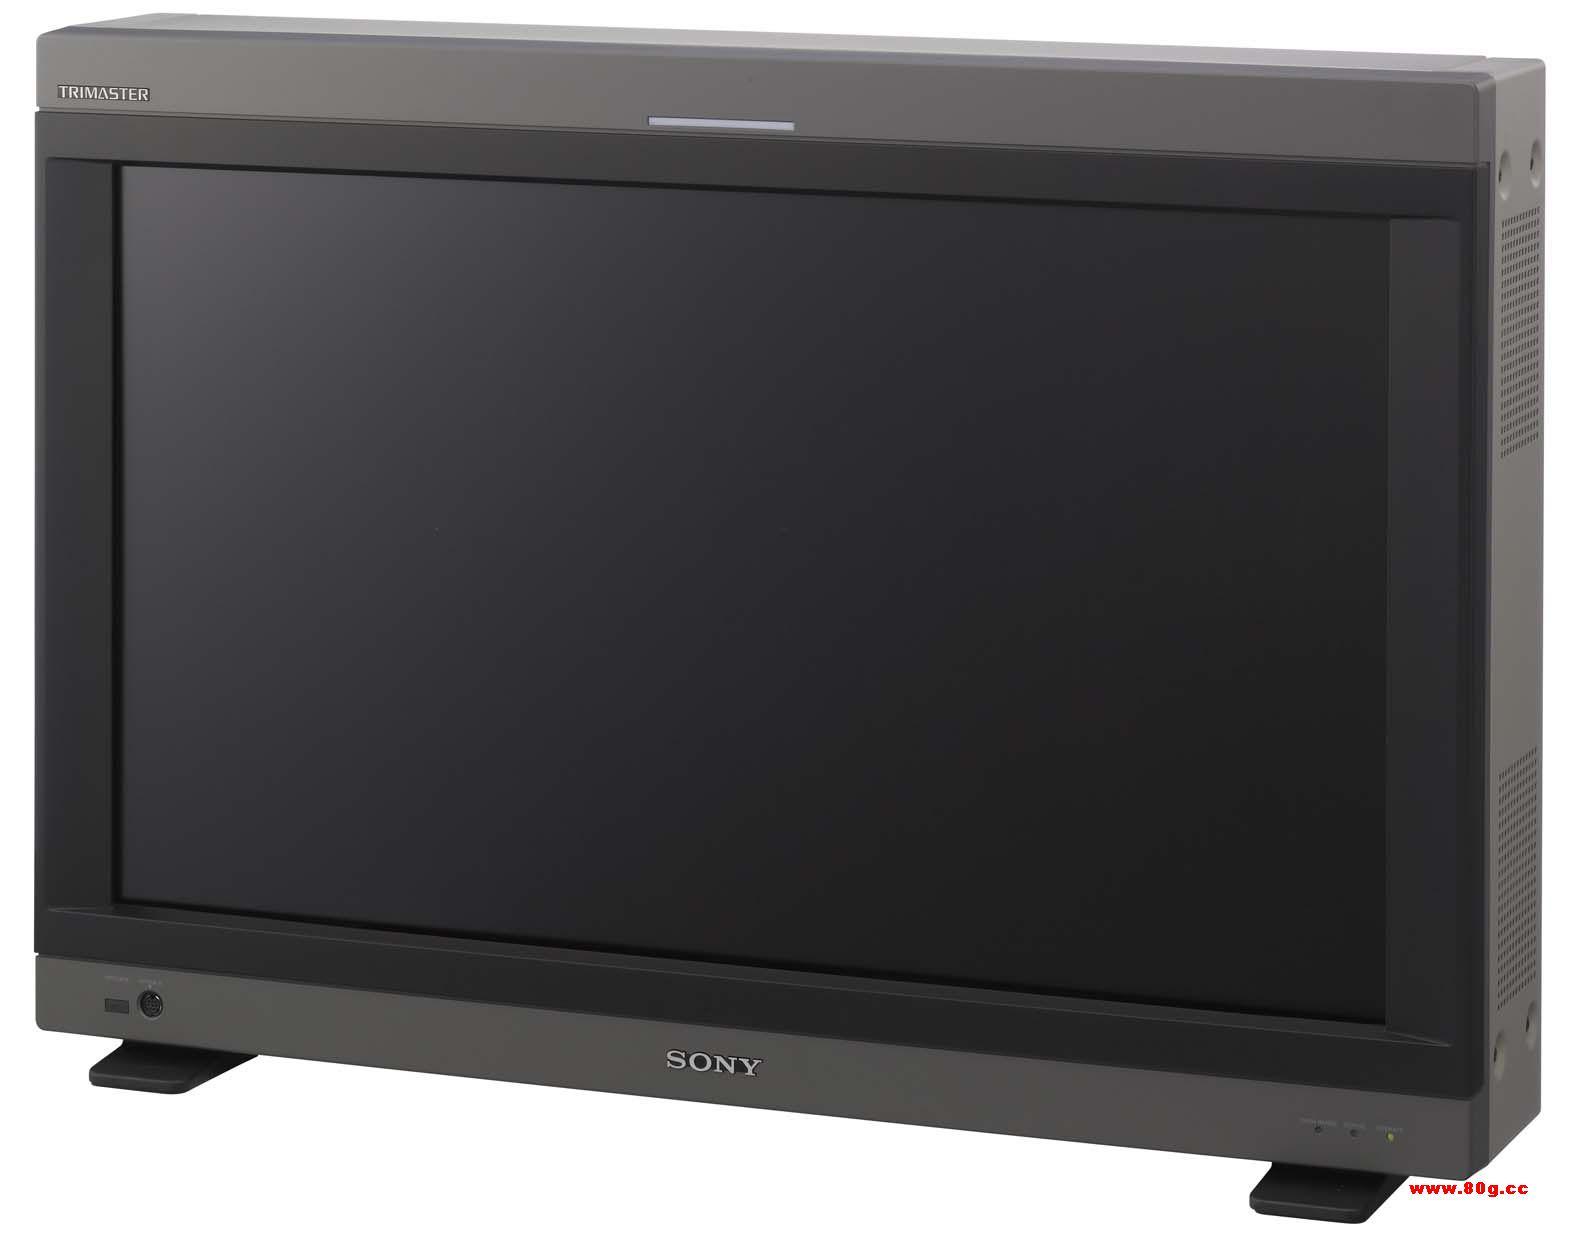 sony监视器(lcd):lmd-1410,lmd-1420,lmd-212,lmd-172